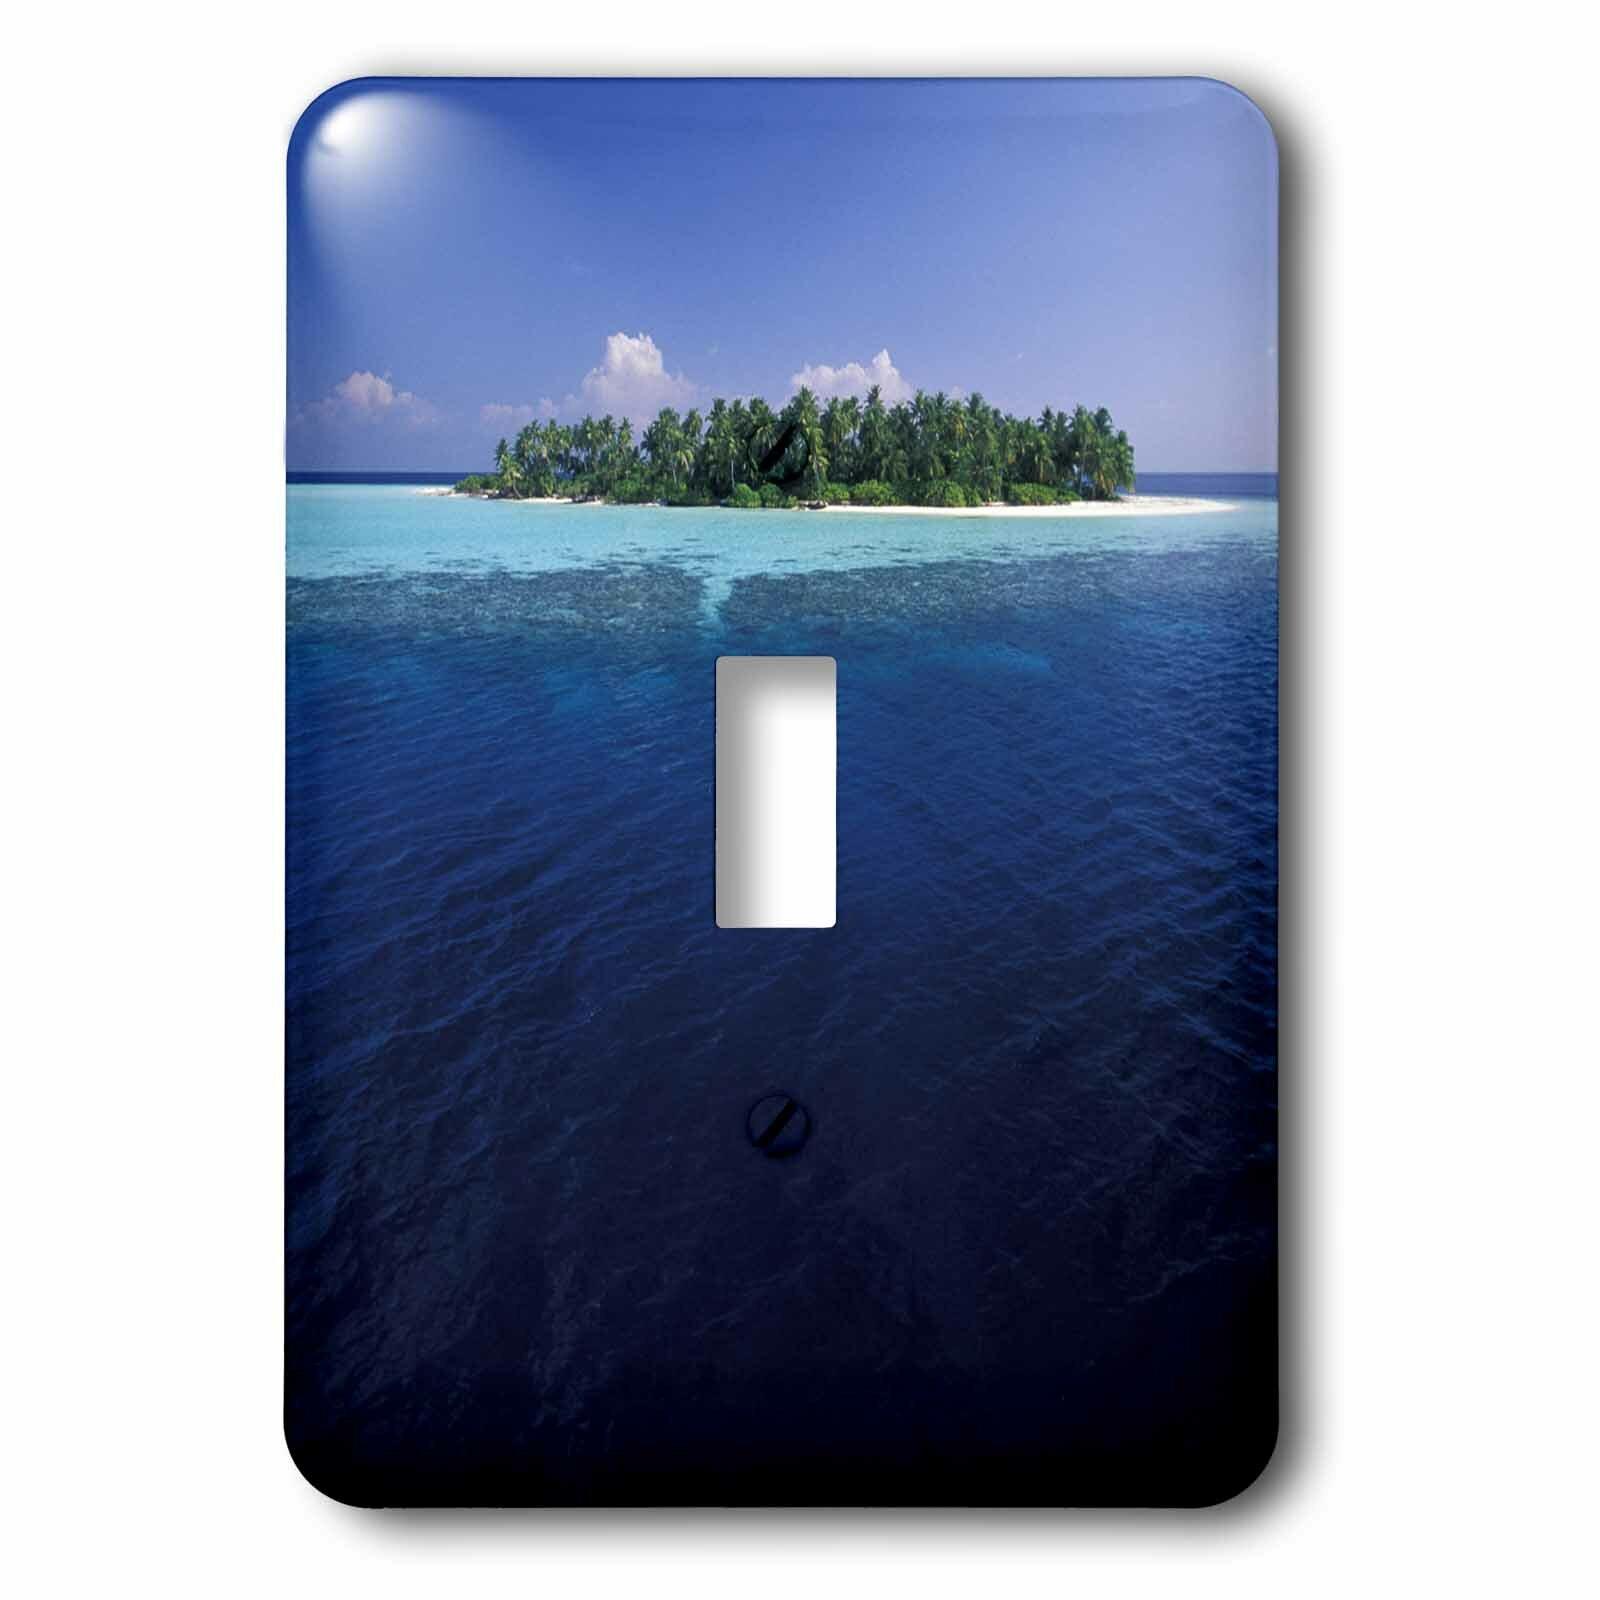 3drose Maldives Ari Atoll Uninhabited Tropical Island 1 Gang Toggle Light Switch Wall Plate Wayfair